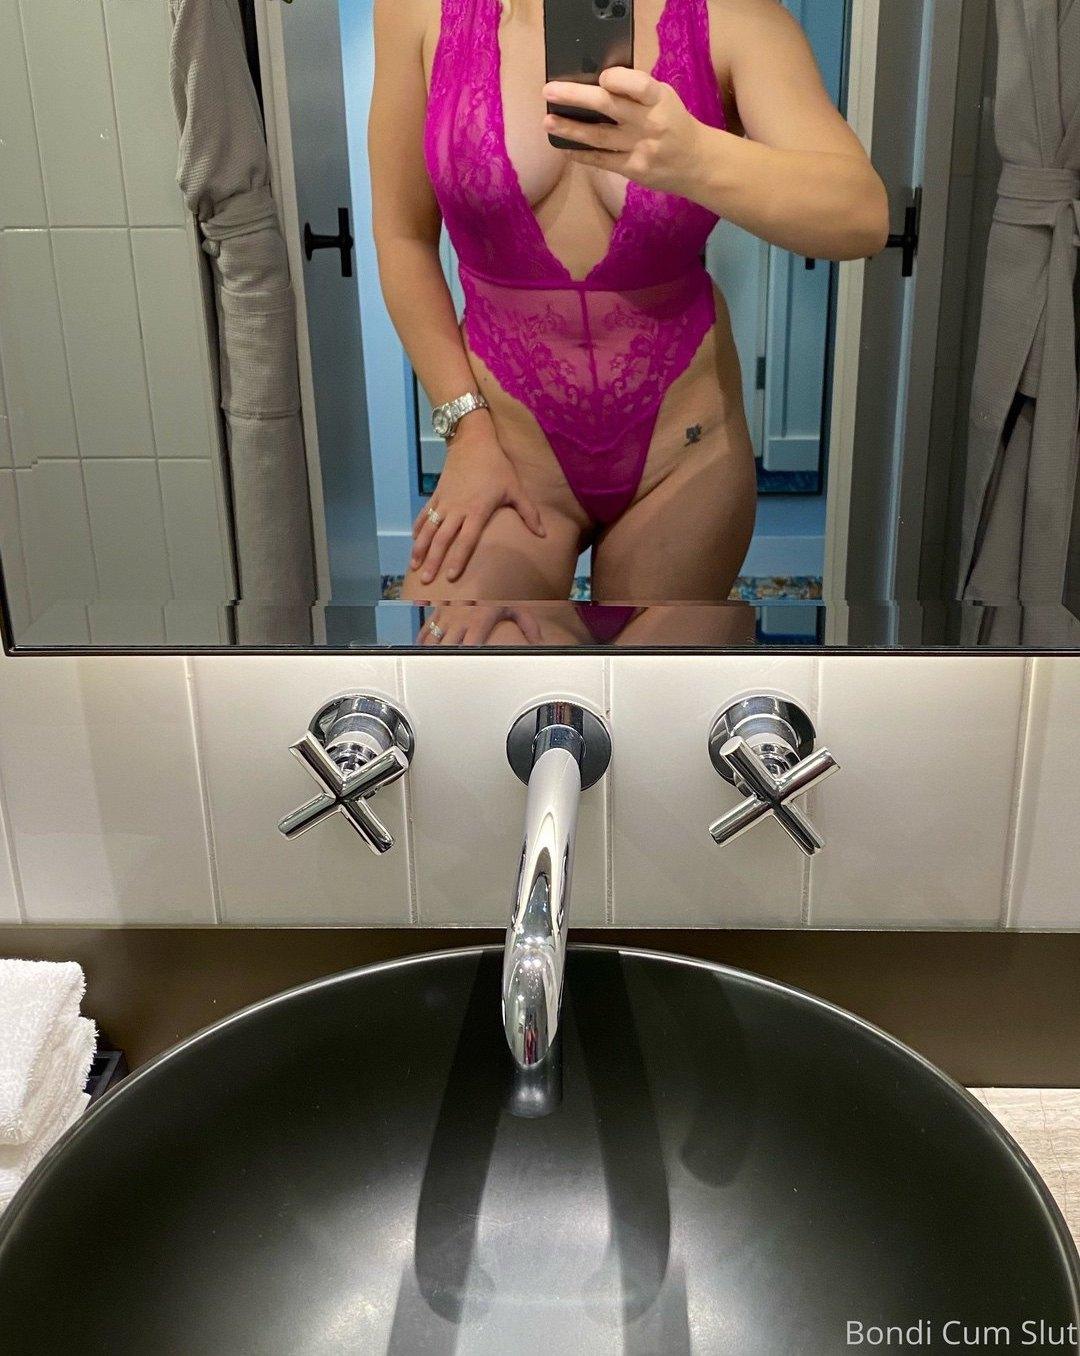 Bondi Cum Slut Bondicumslut Onlyfans Nudes Leaks 0020